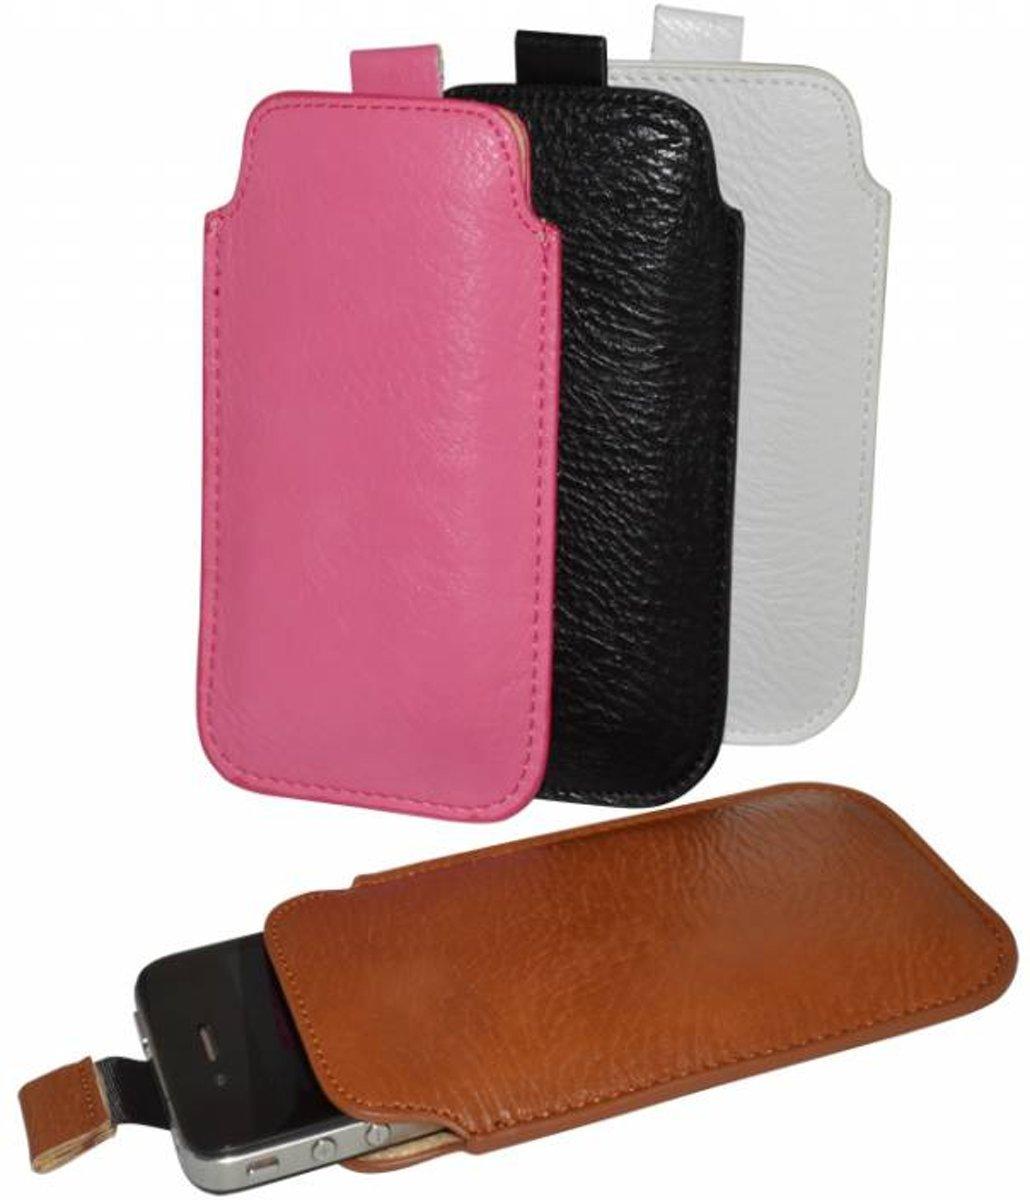 Universeel Smartphone Hoesje Bruin Merk I12cover Android Lg L70 D325 Free Flip Windows Case